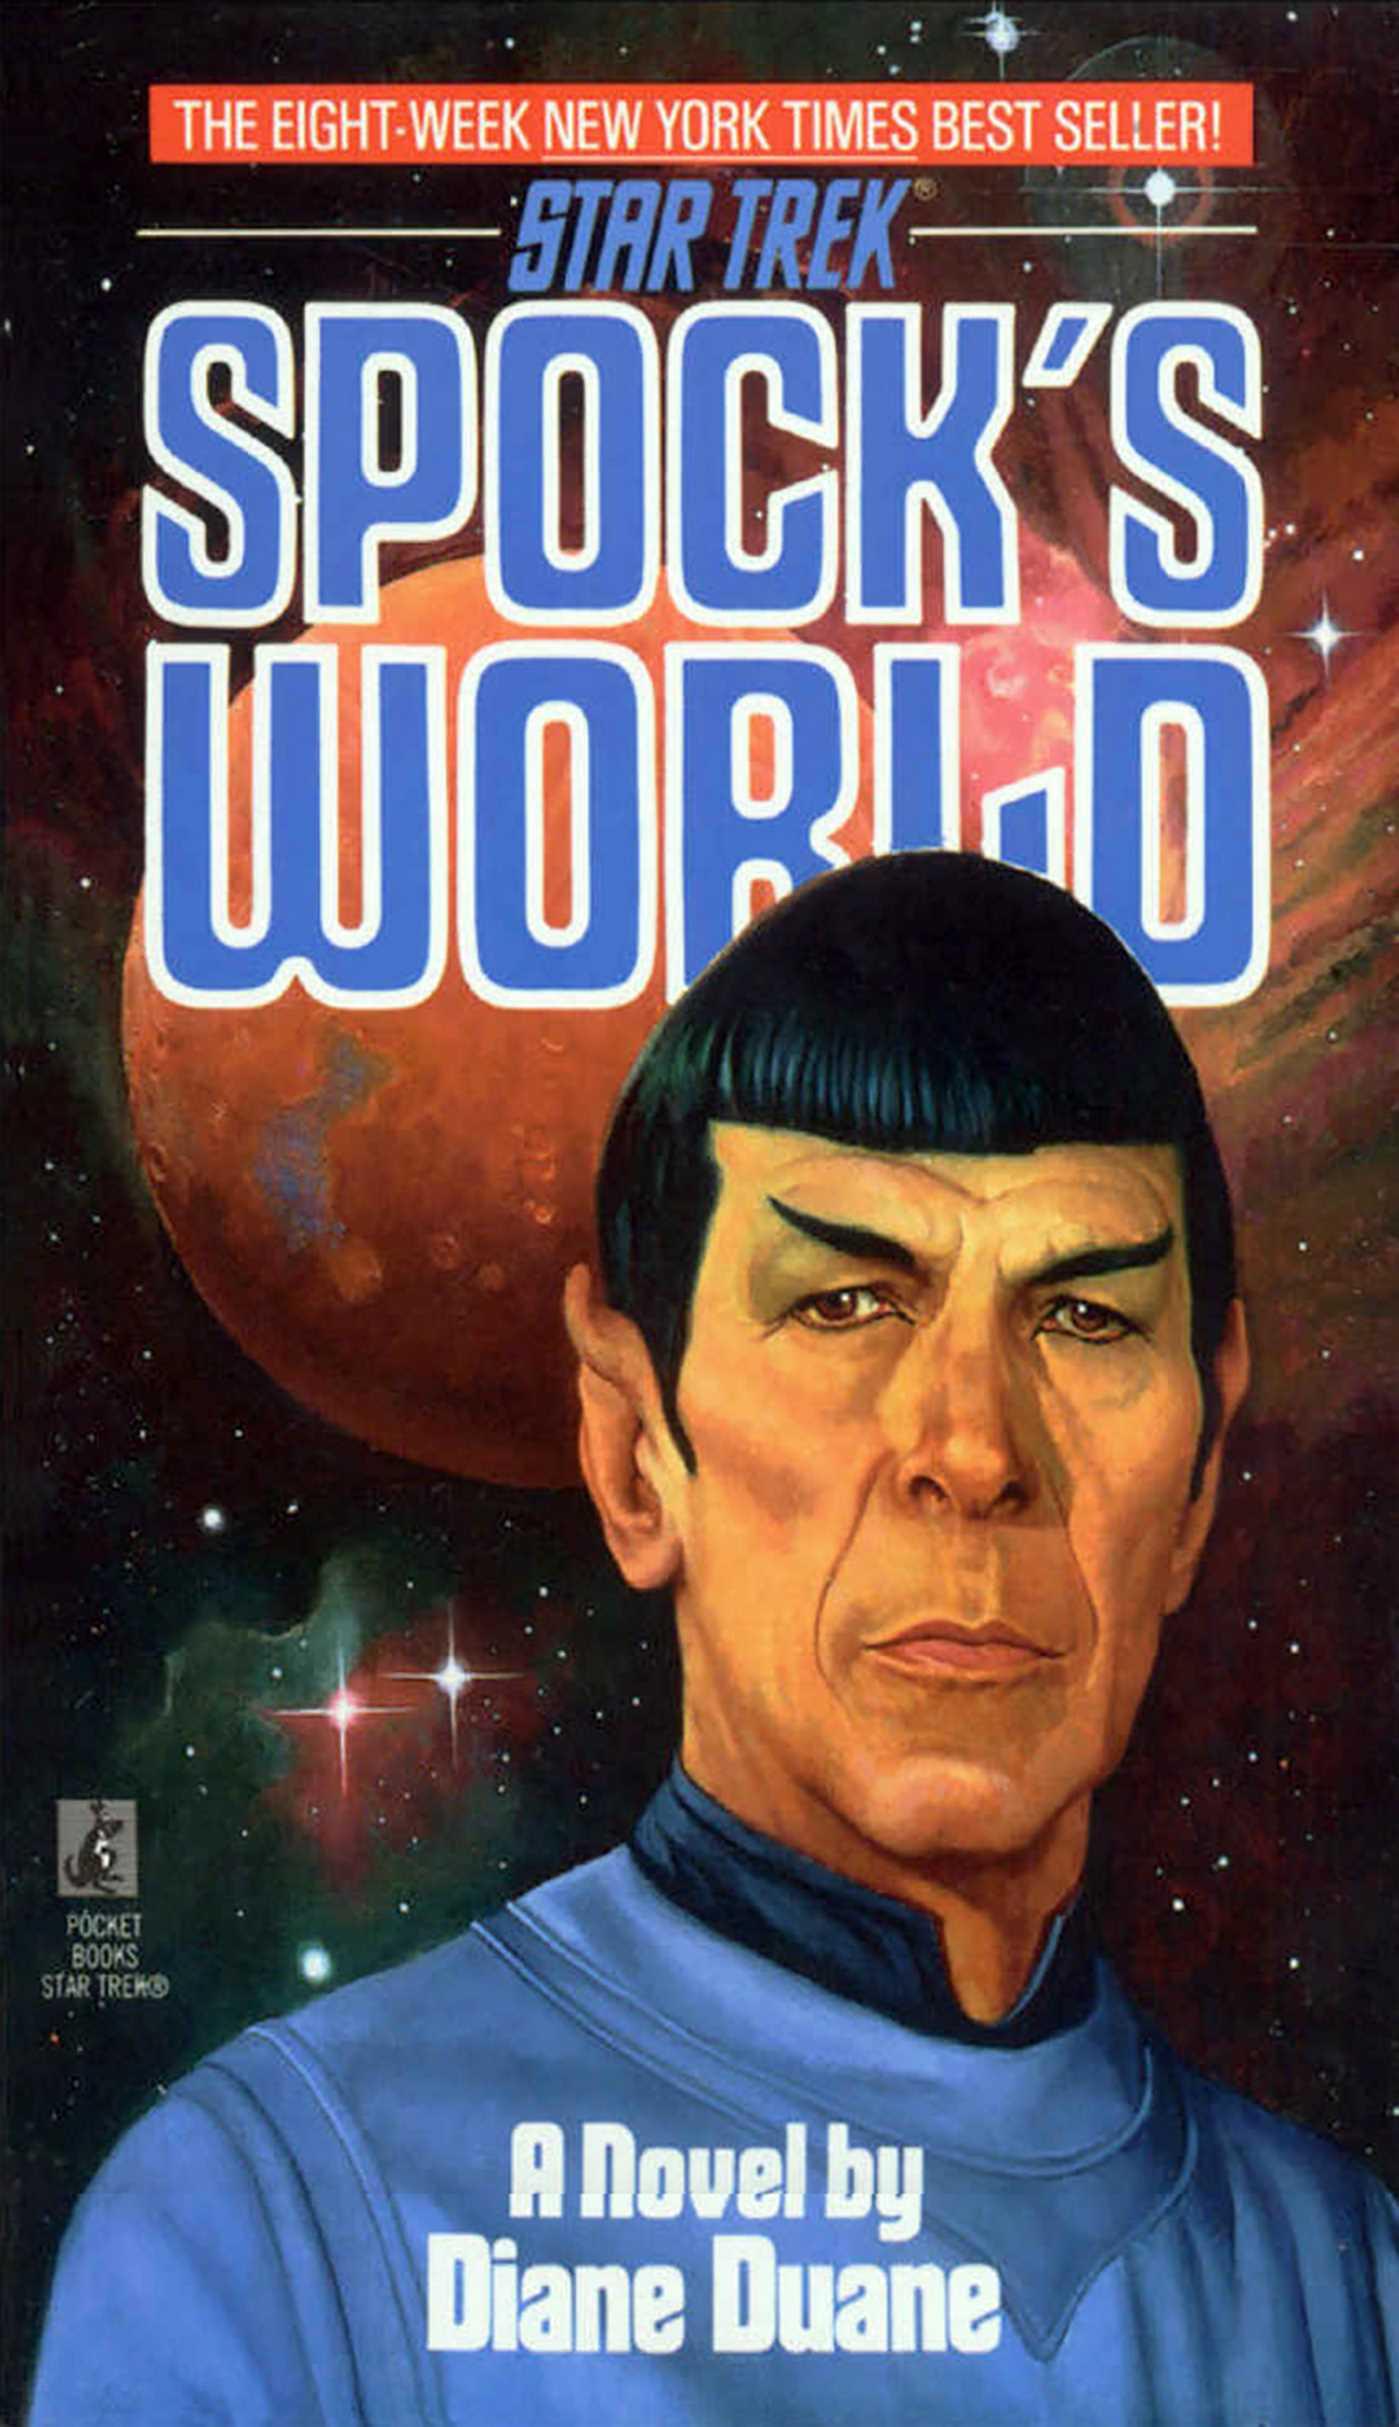 Spocks world 9780671041137 hr